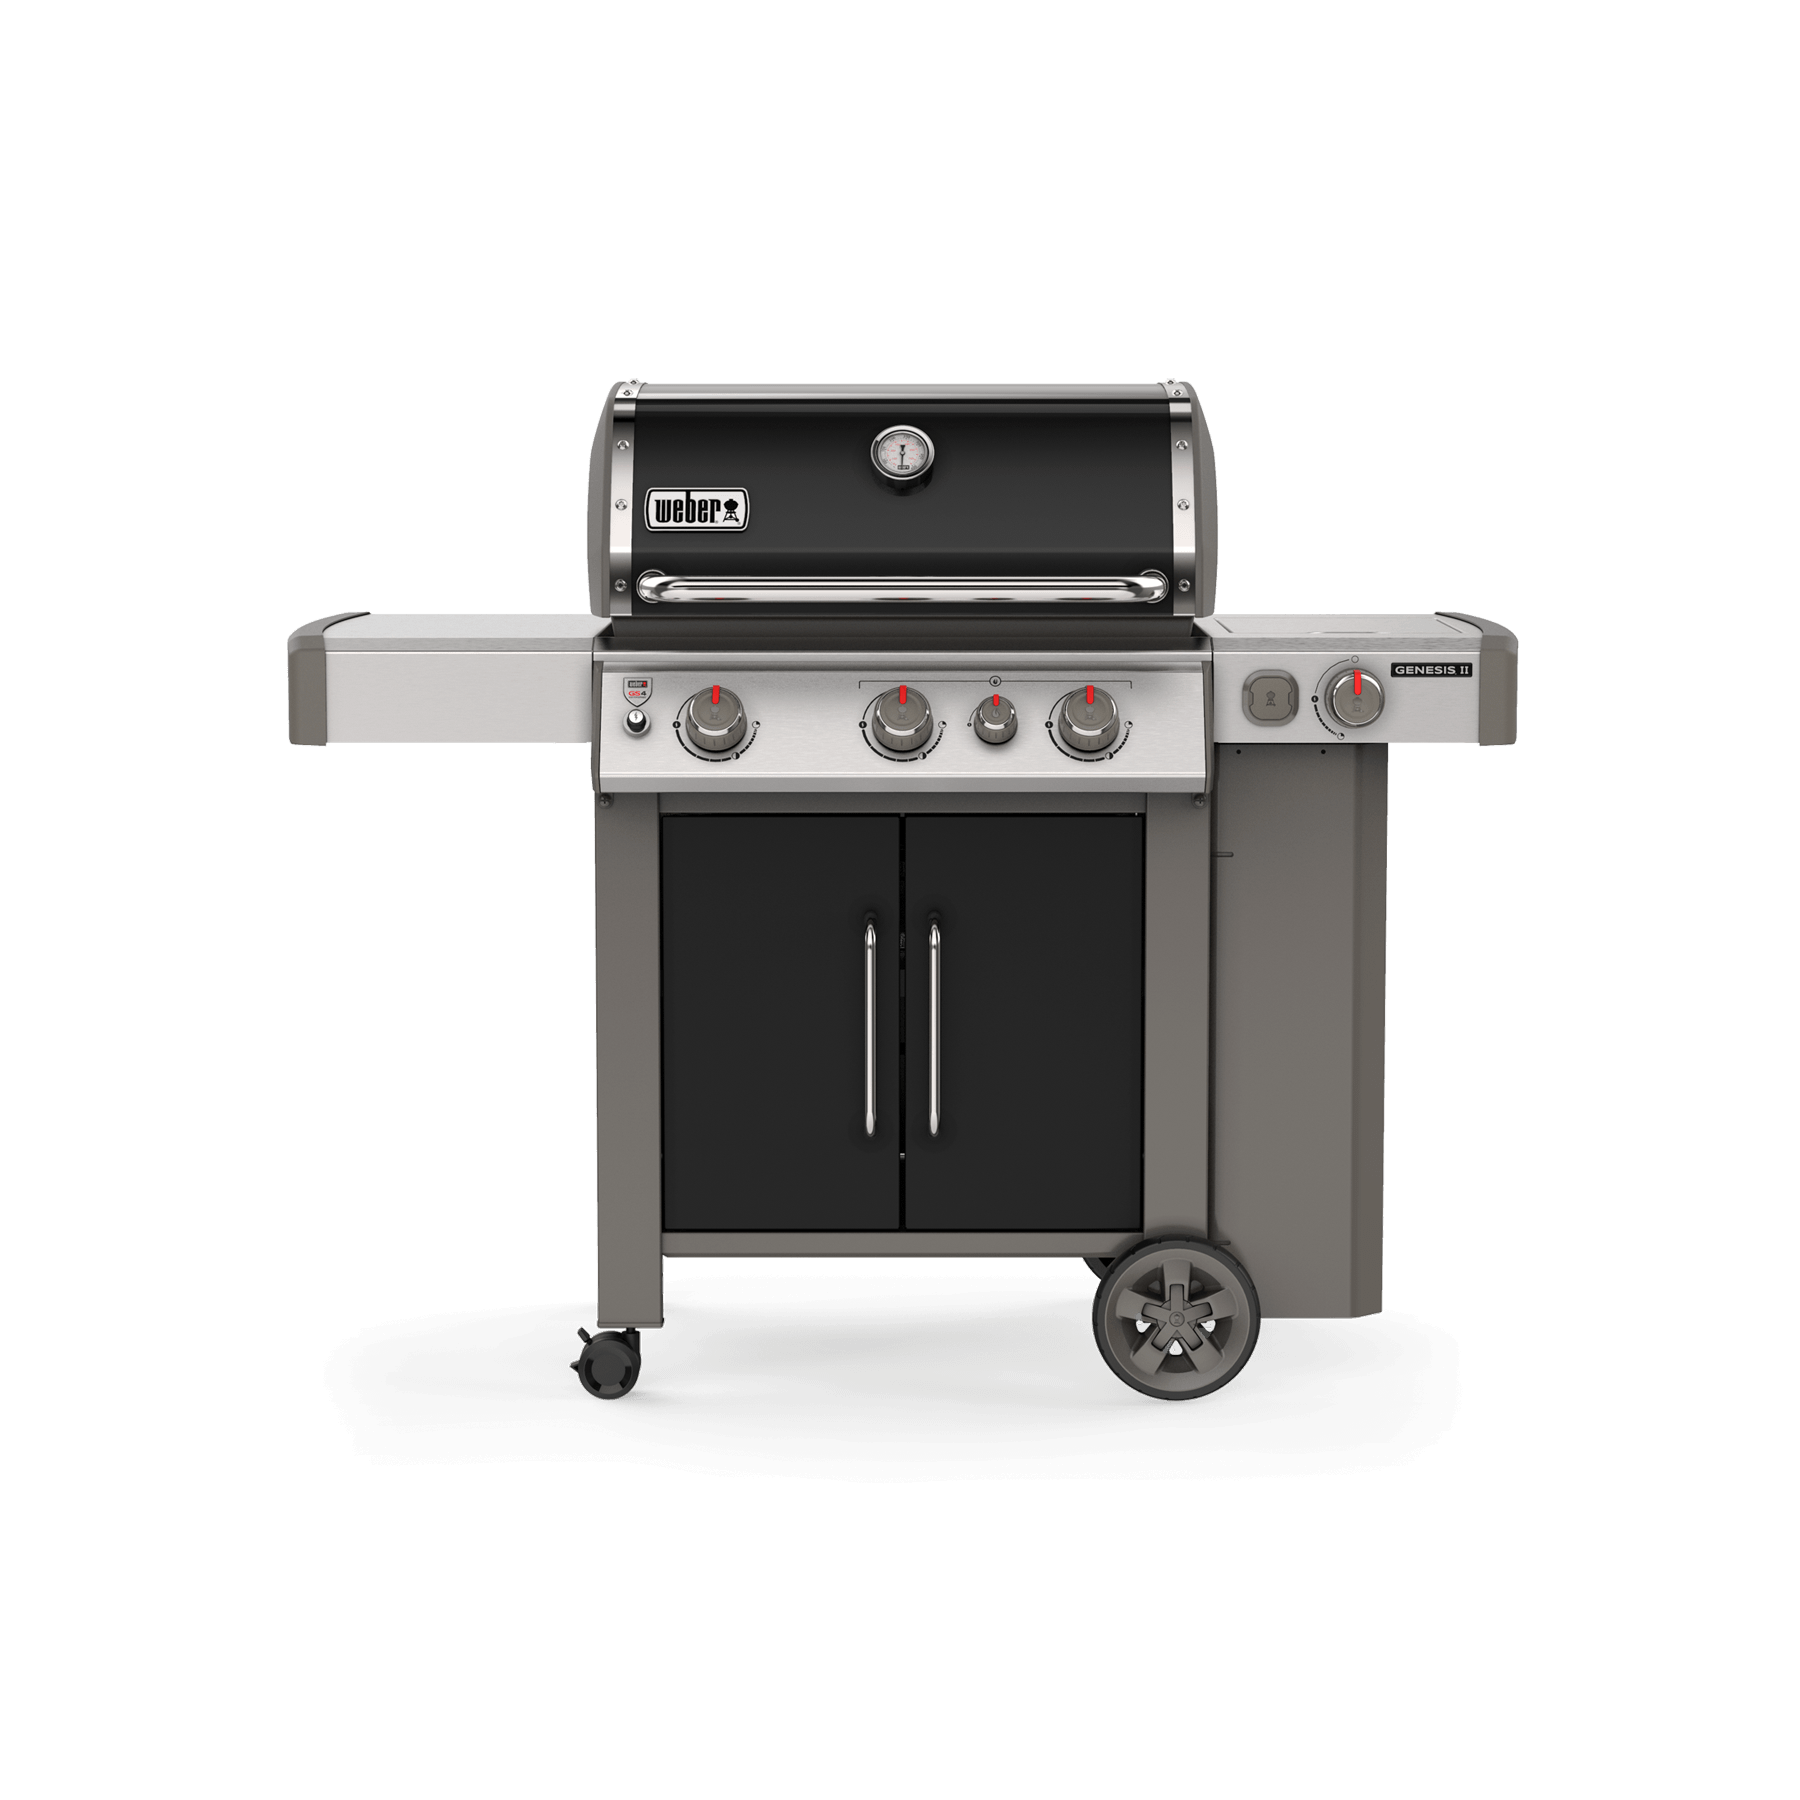 weber gasgrills - die genesis modelle | weber® grill original